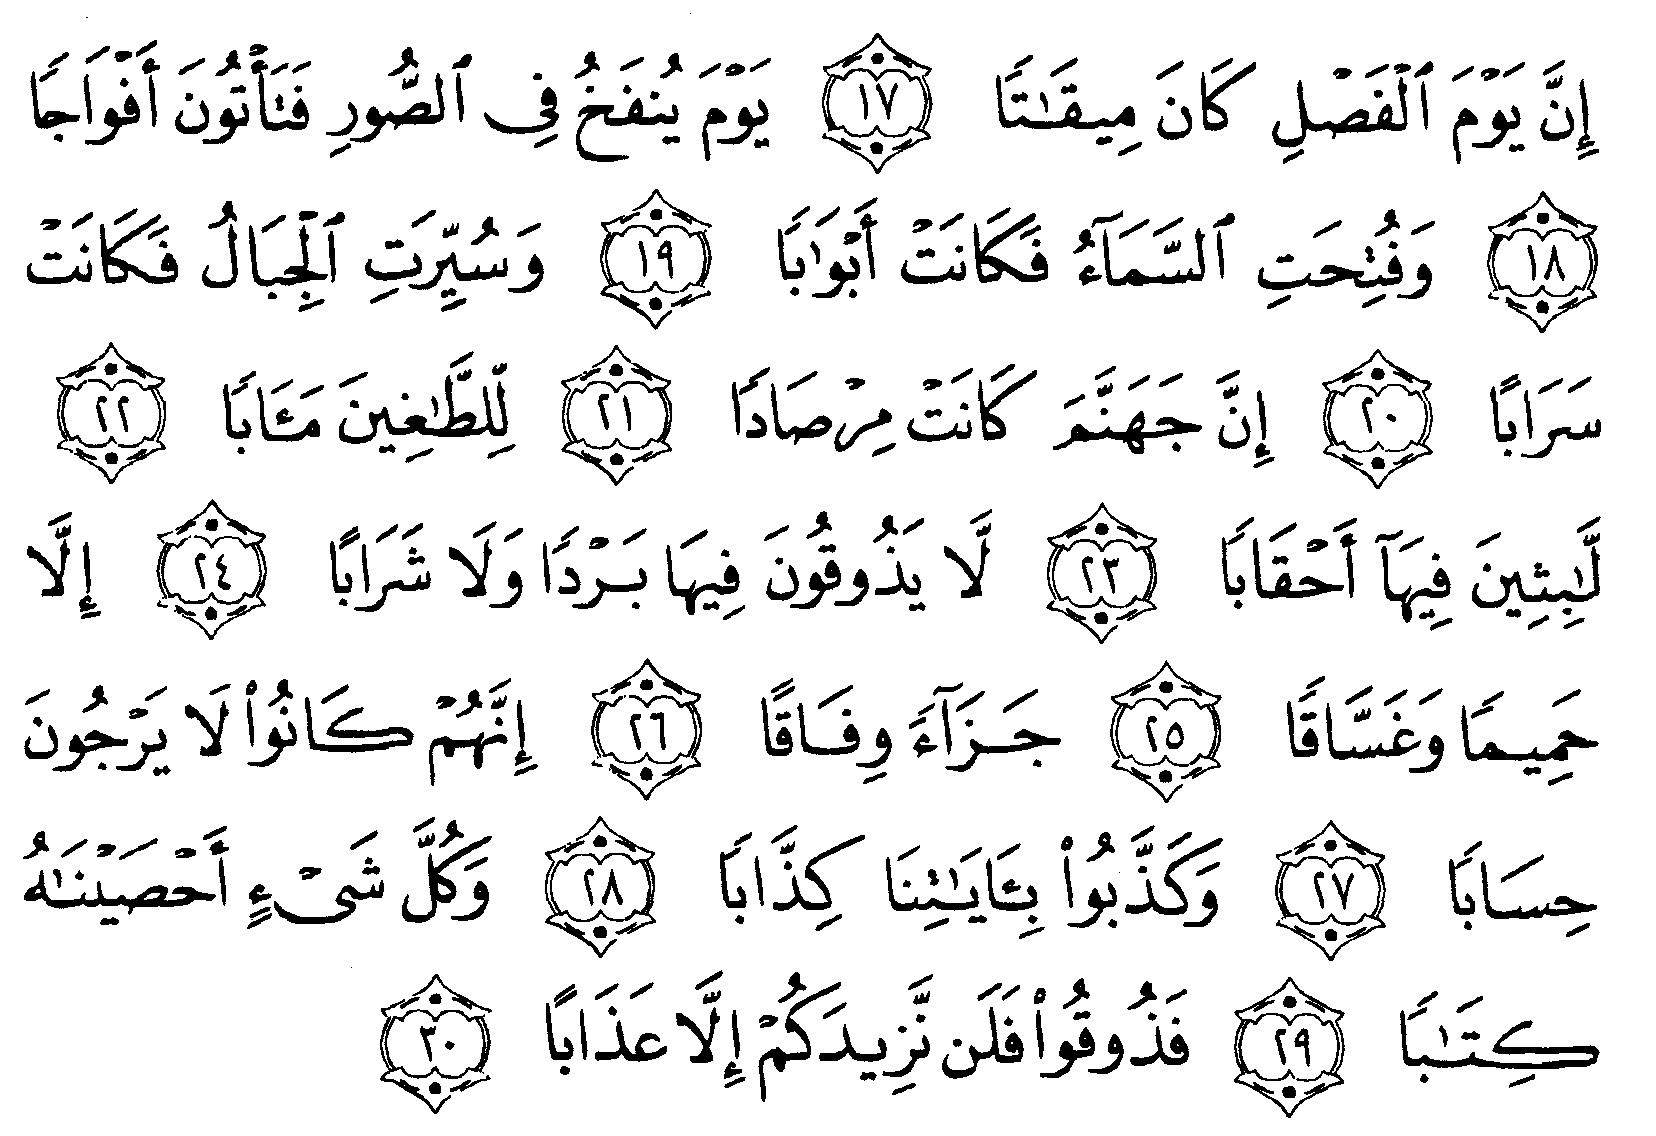 "tulisan arab alquran surat an naba ayat 17 30 """